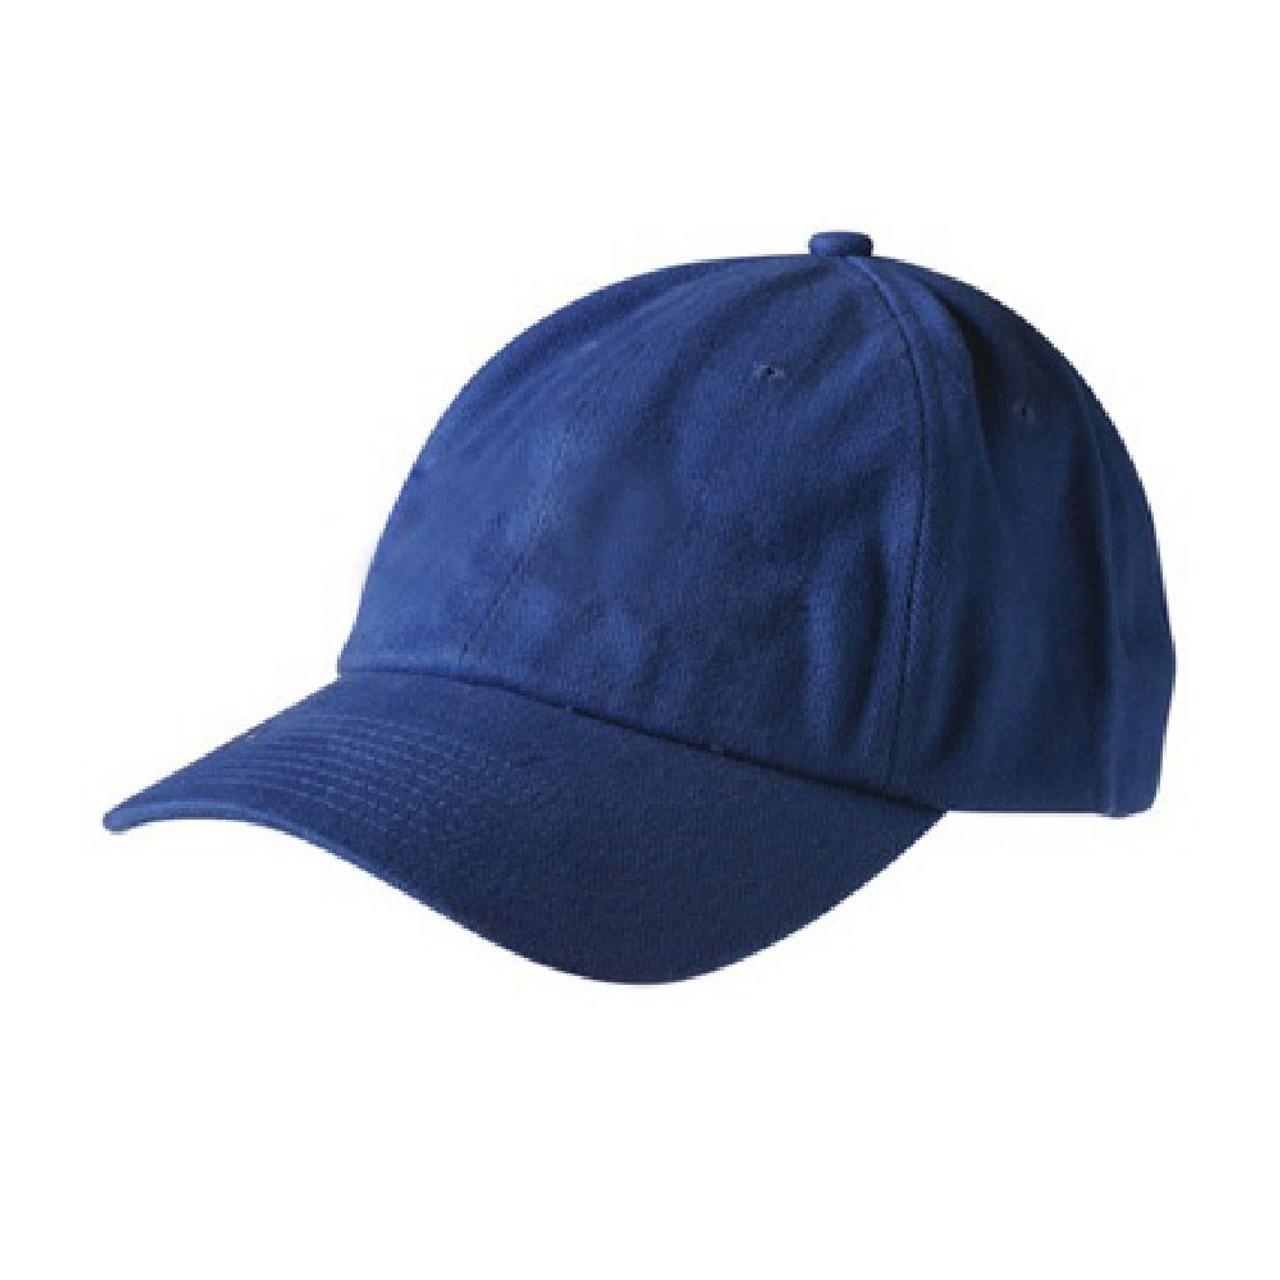 55fac9905 BRO | Unstructured Plain Baseball Caps